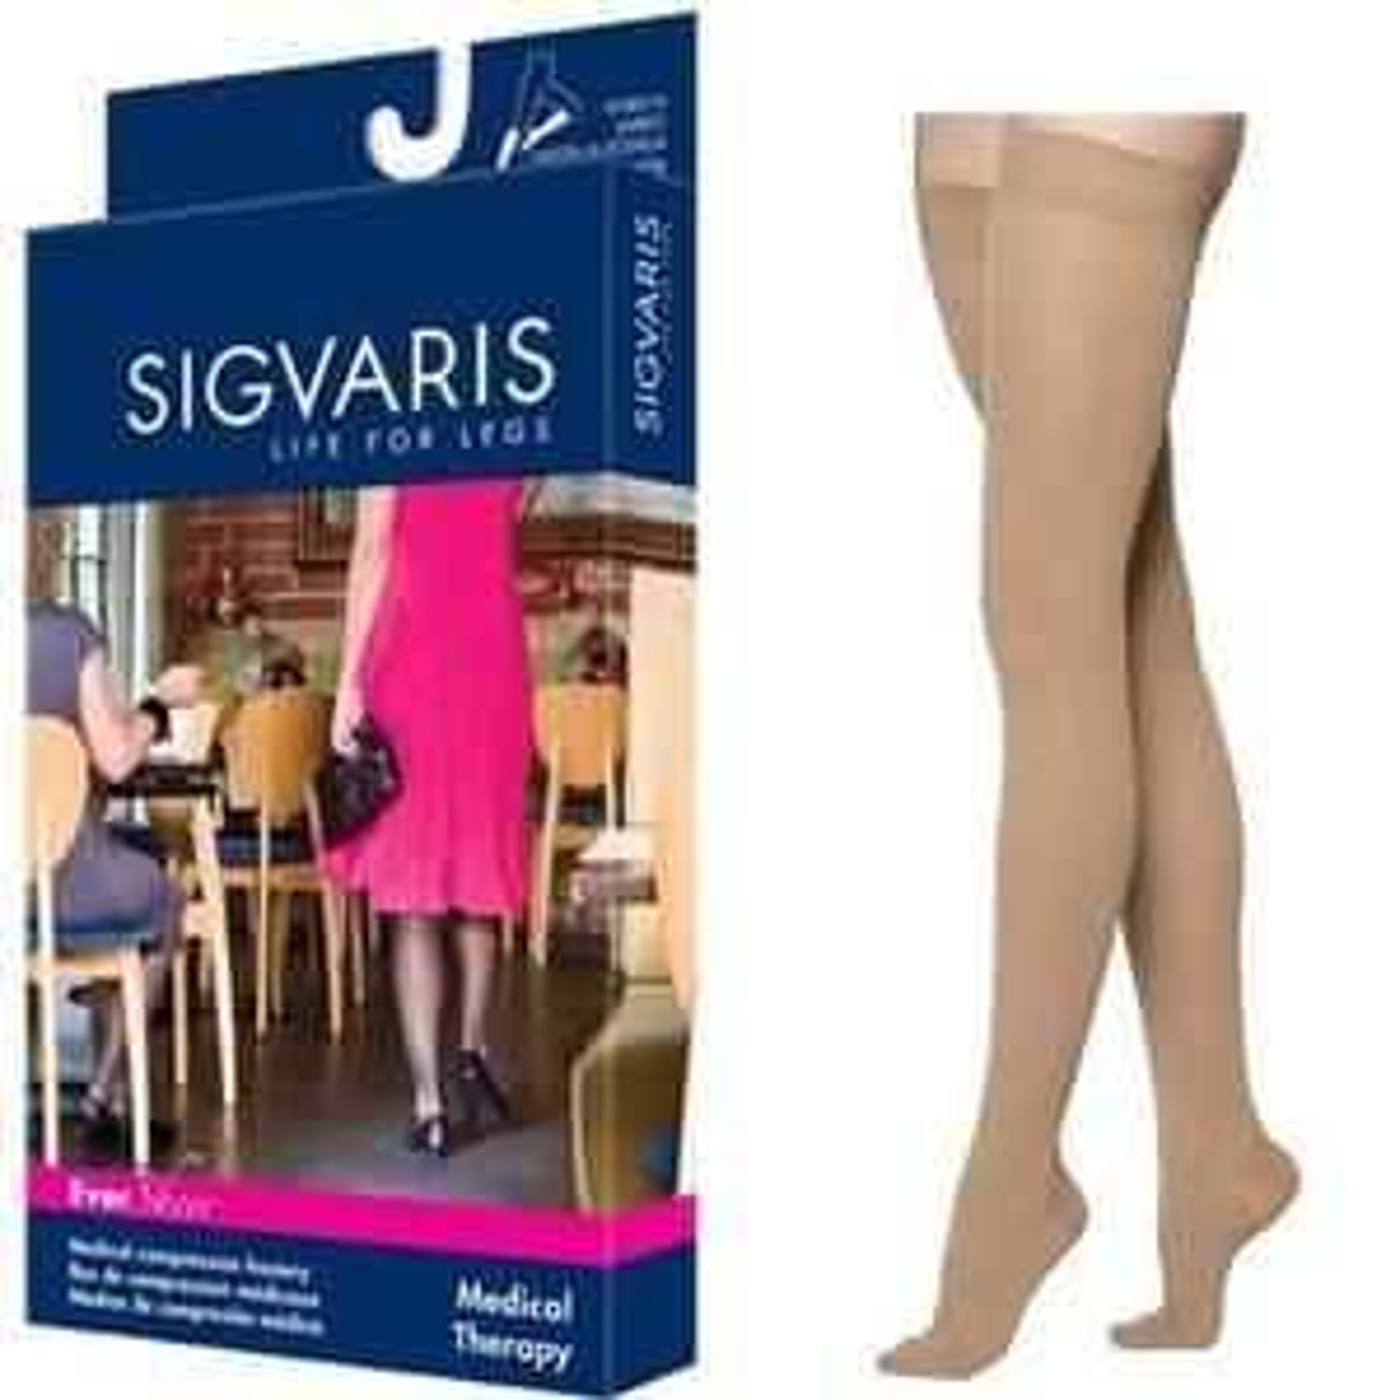 Sigvaris EverSheer Compression Stocking, Thigh-High, Small Short, 30-40 mmHg